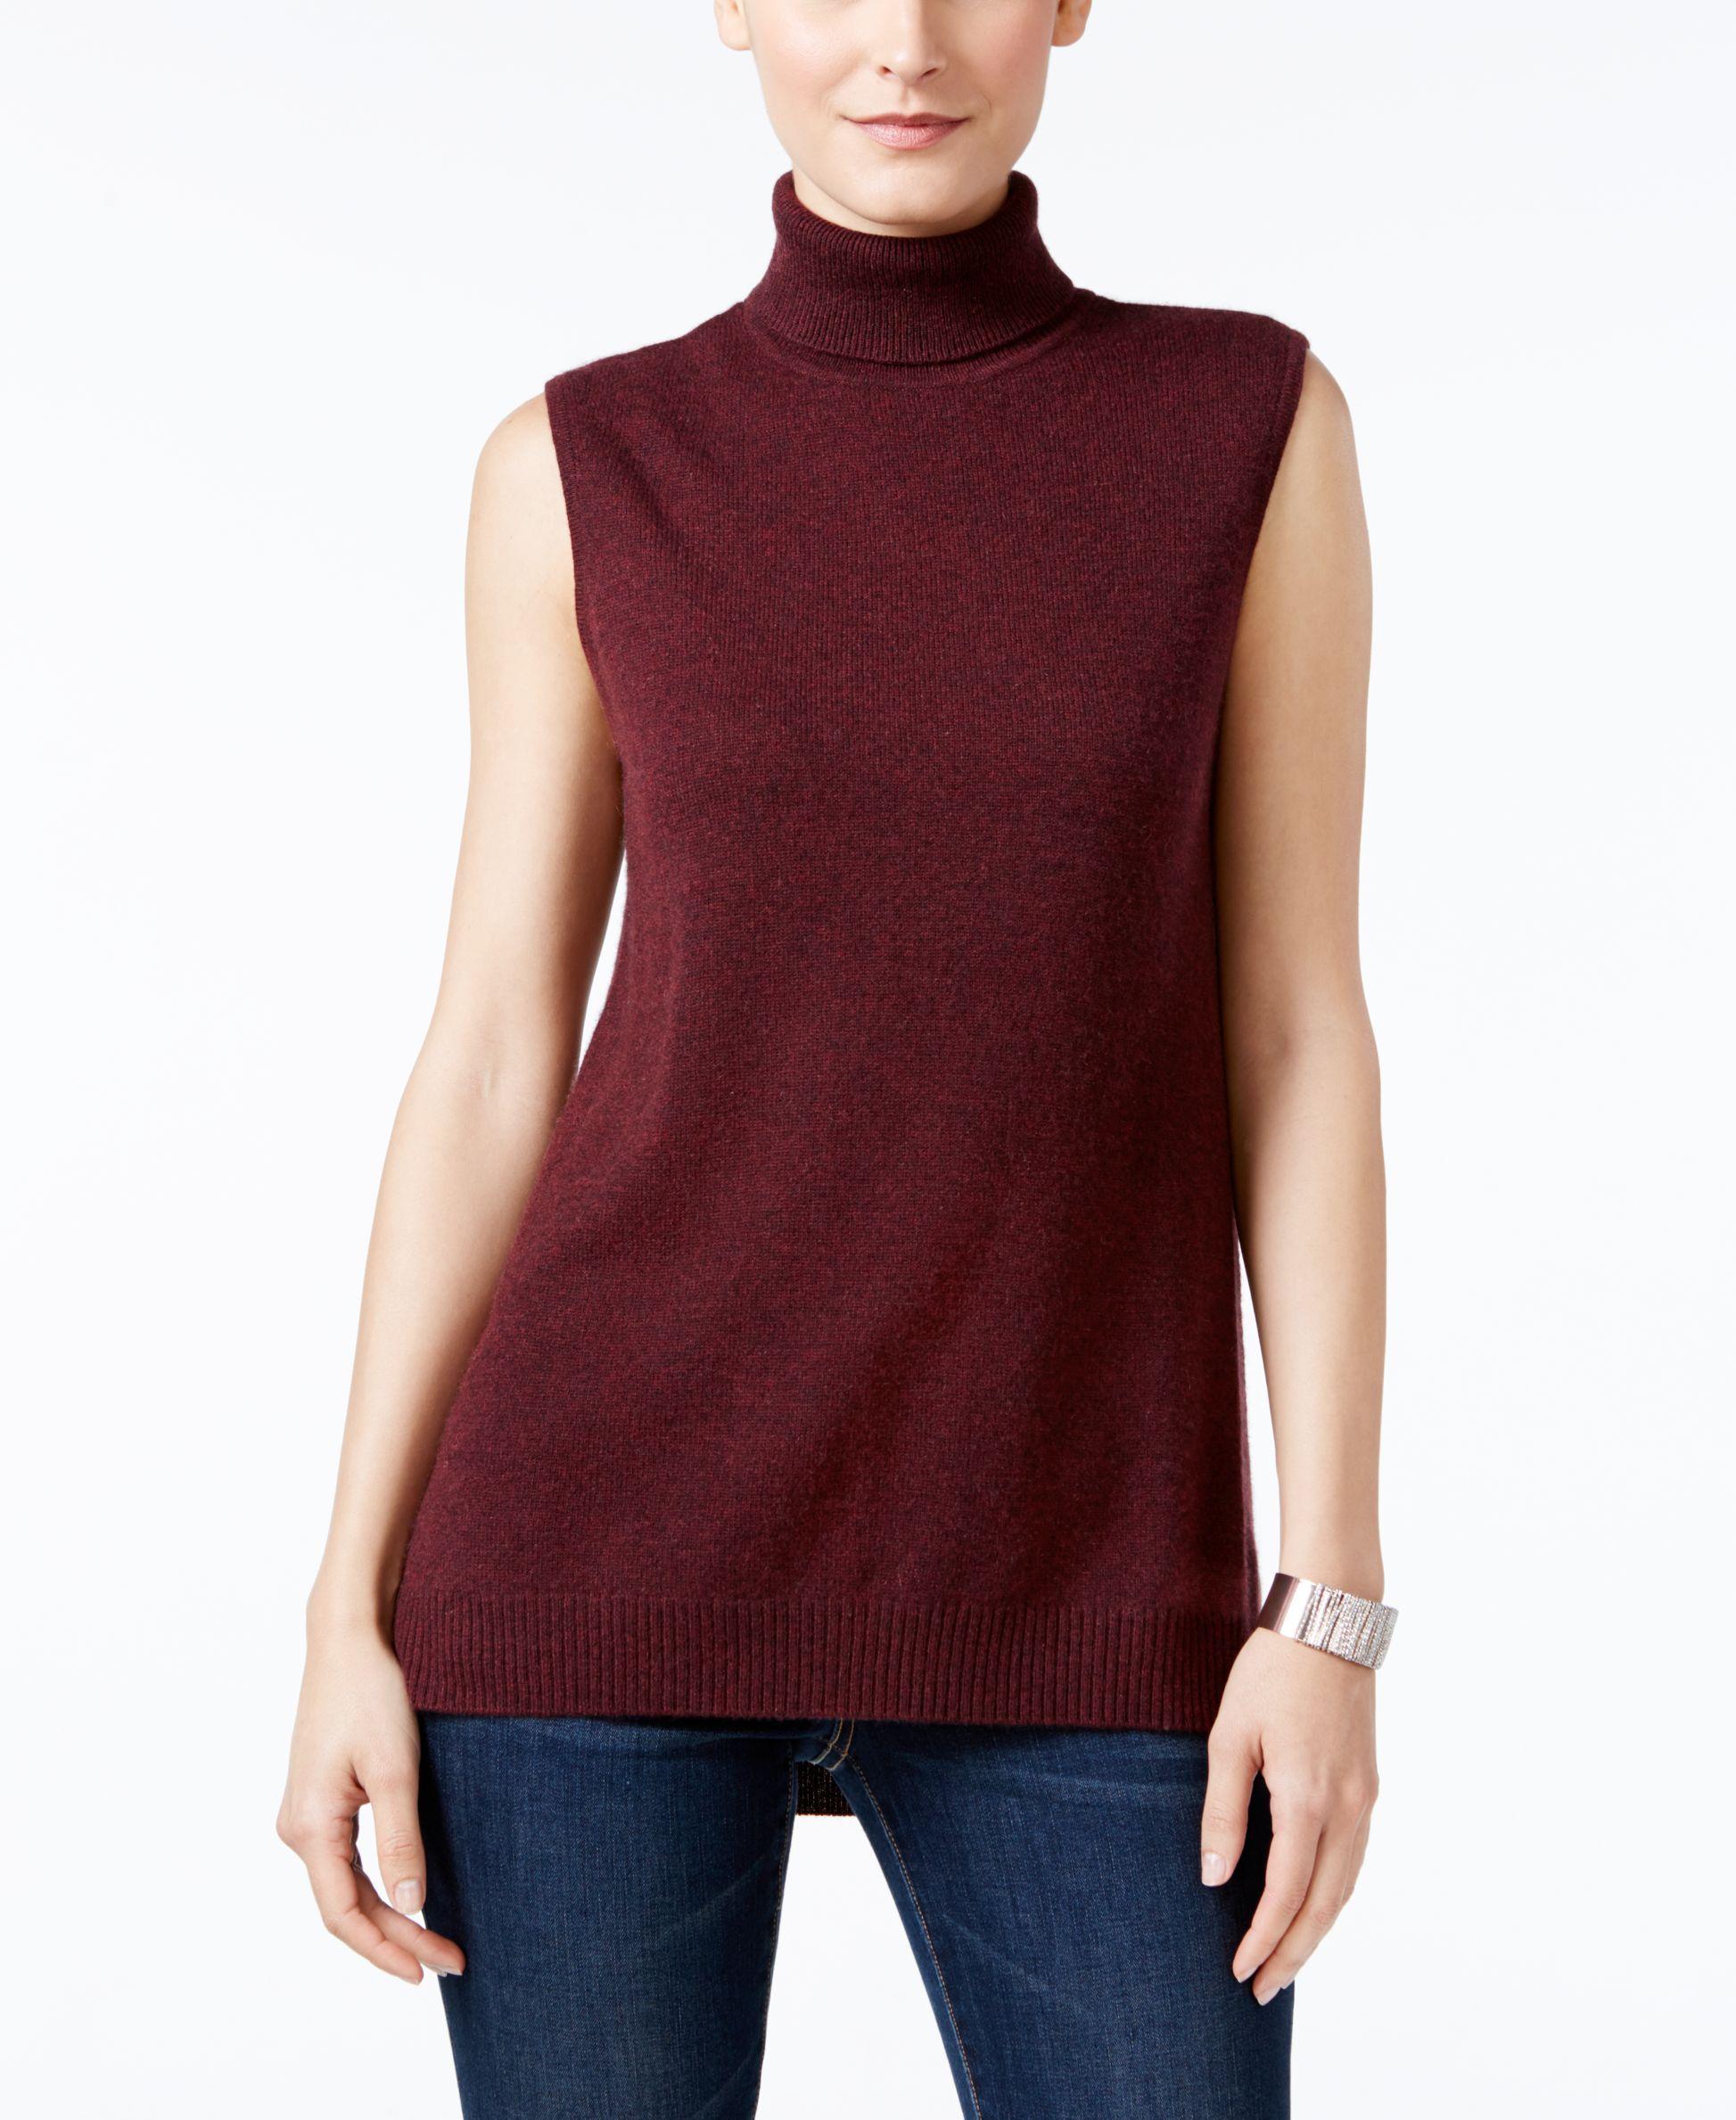 9d06504b621b8 Charter Club Cashmere Sleeveless Turtleneck Sweater